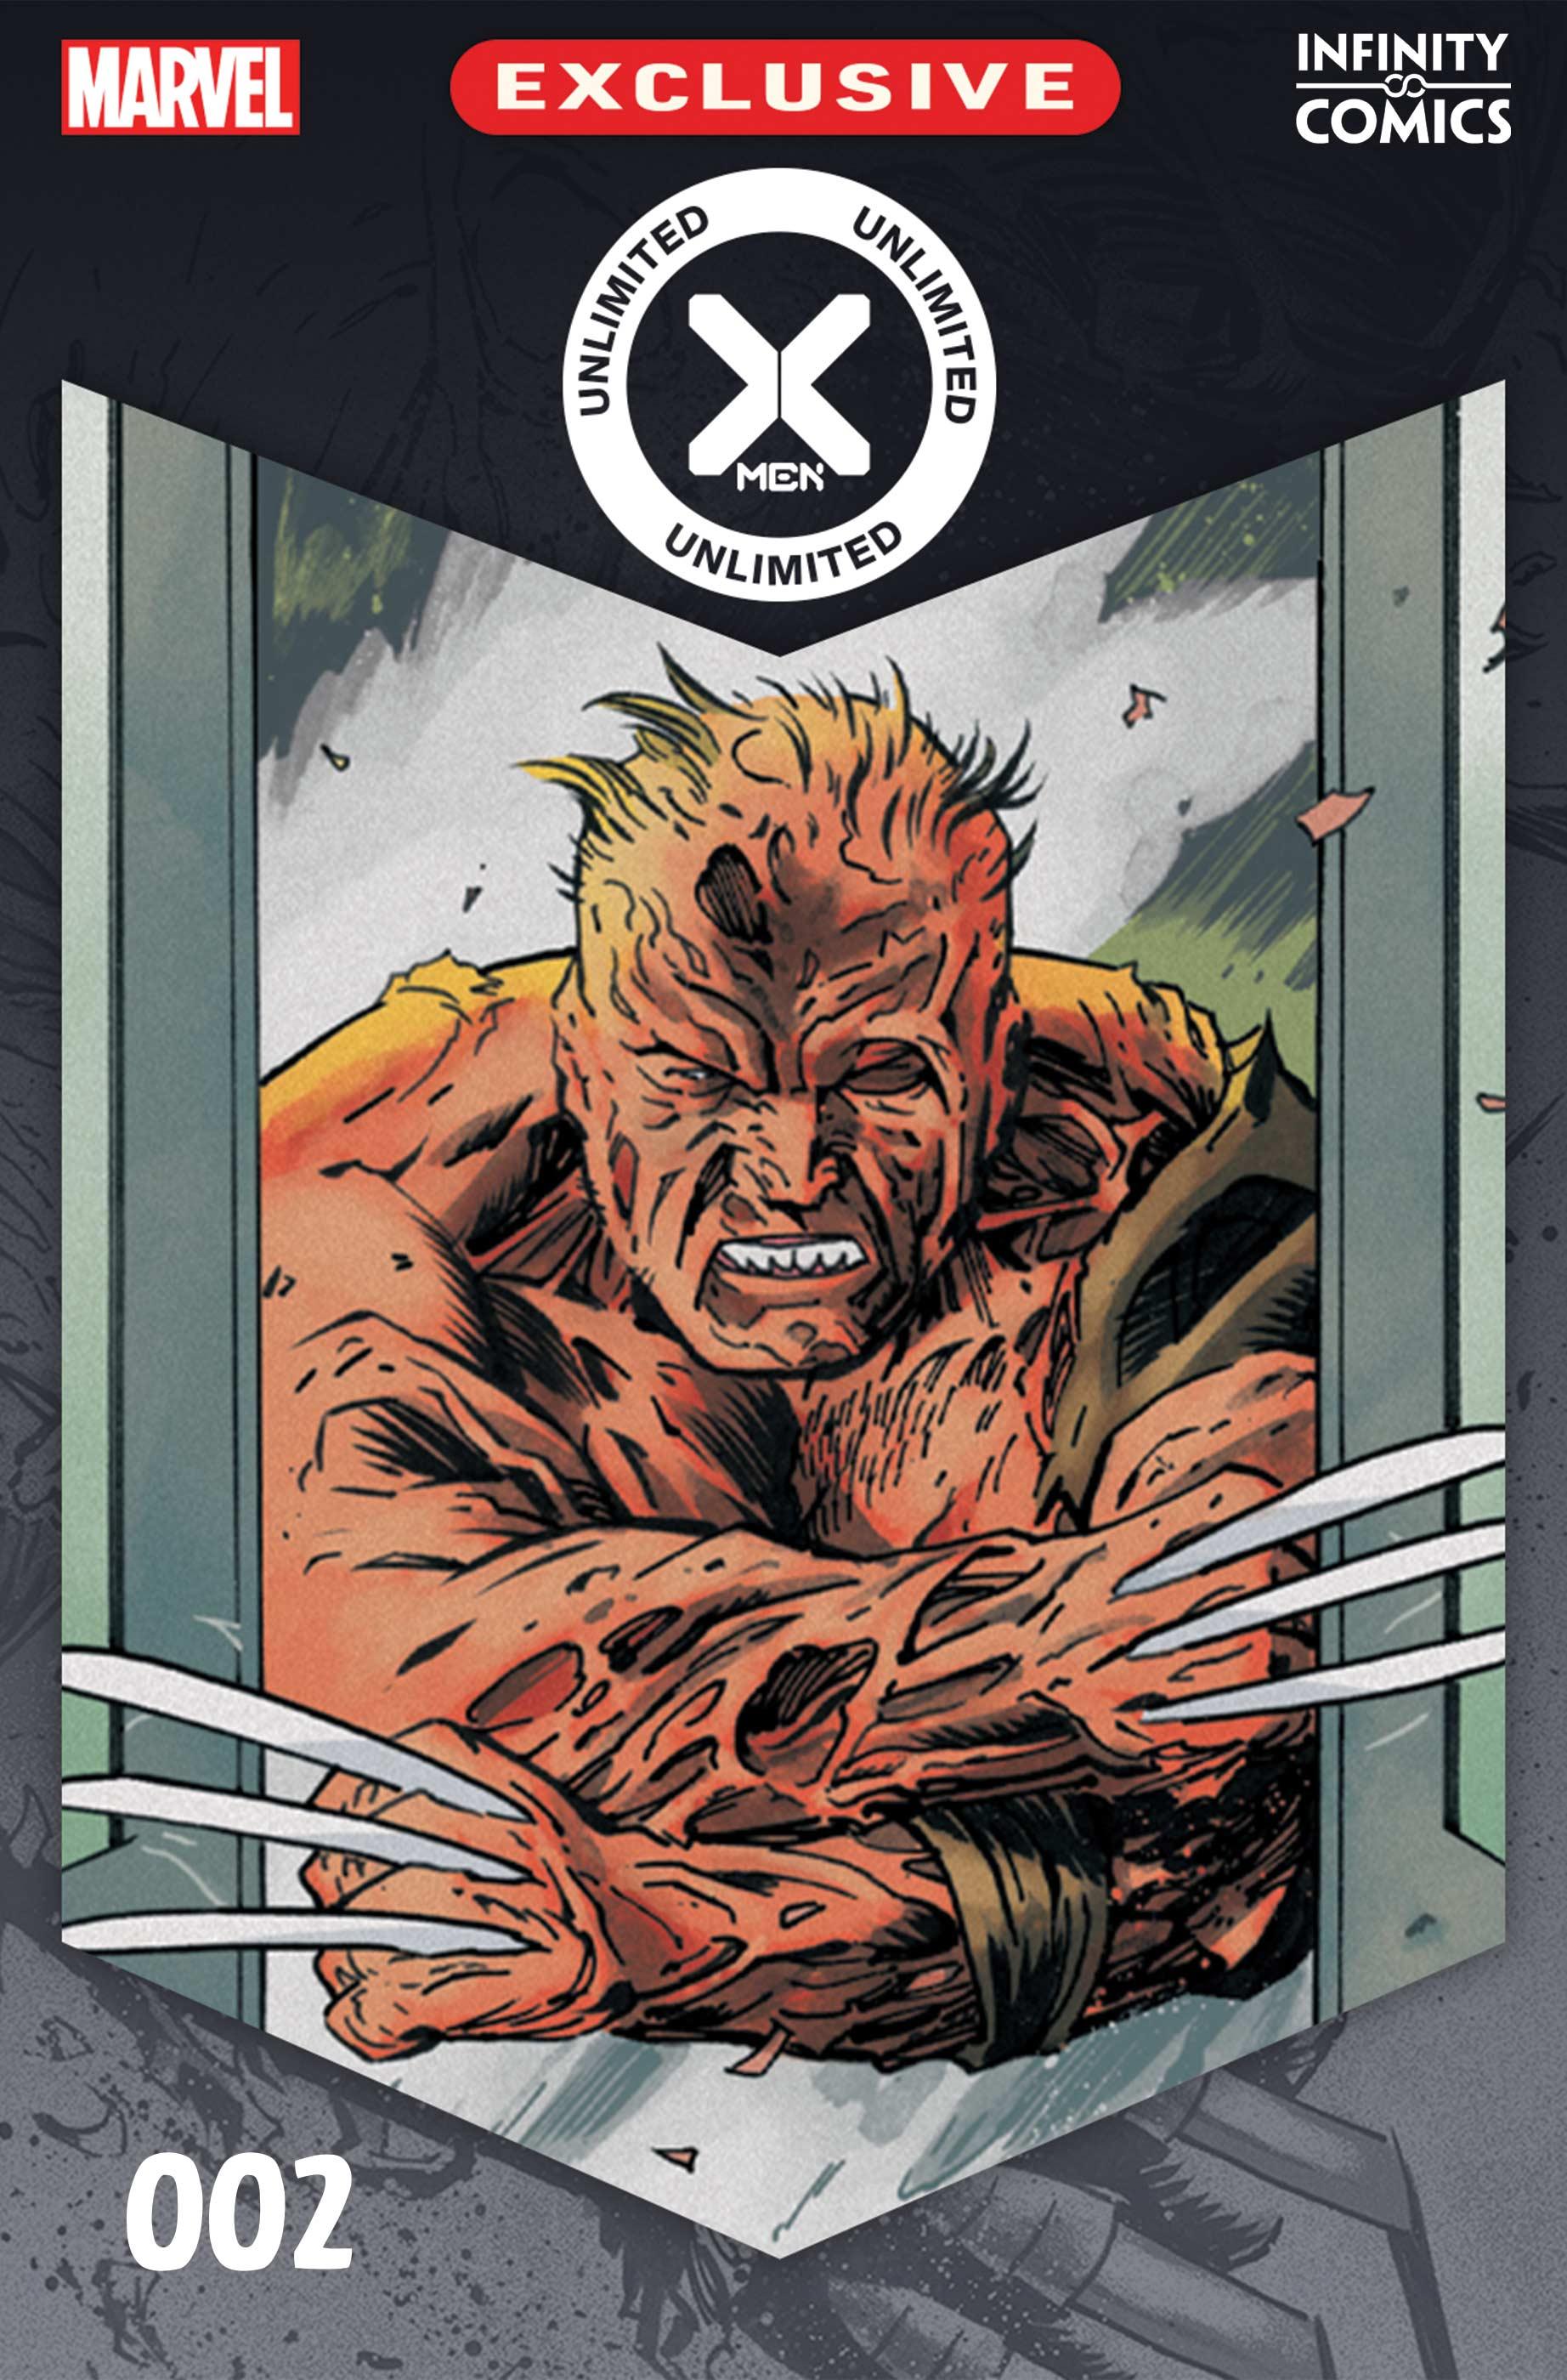 X-Men Unlimited Infinity Comic (2021) #2